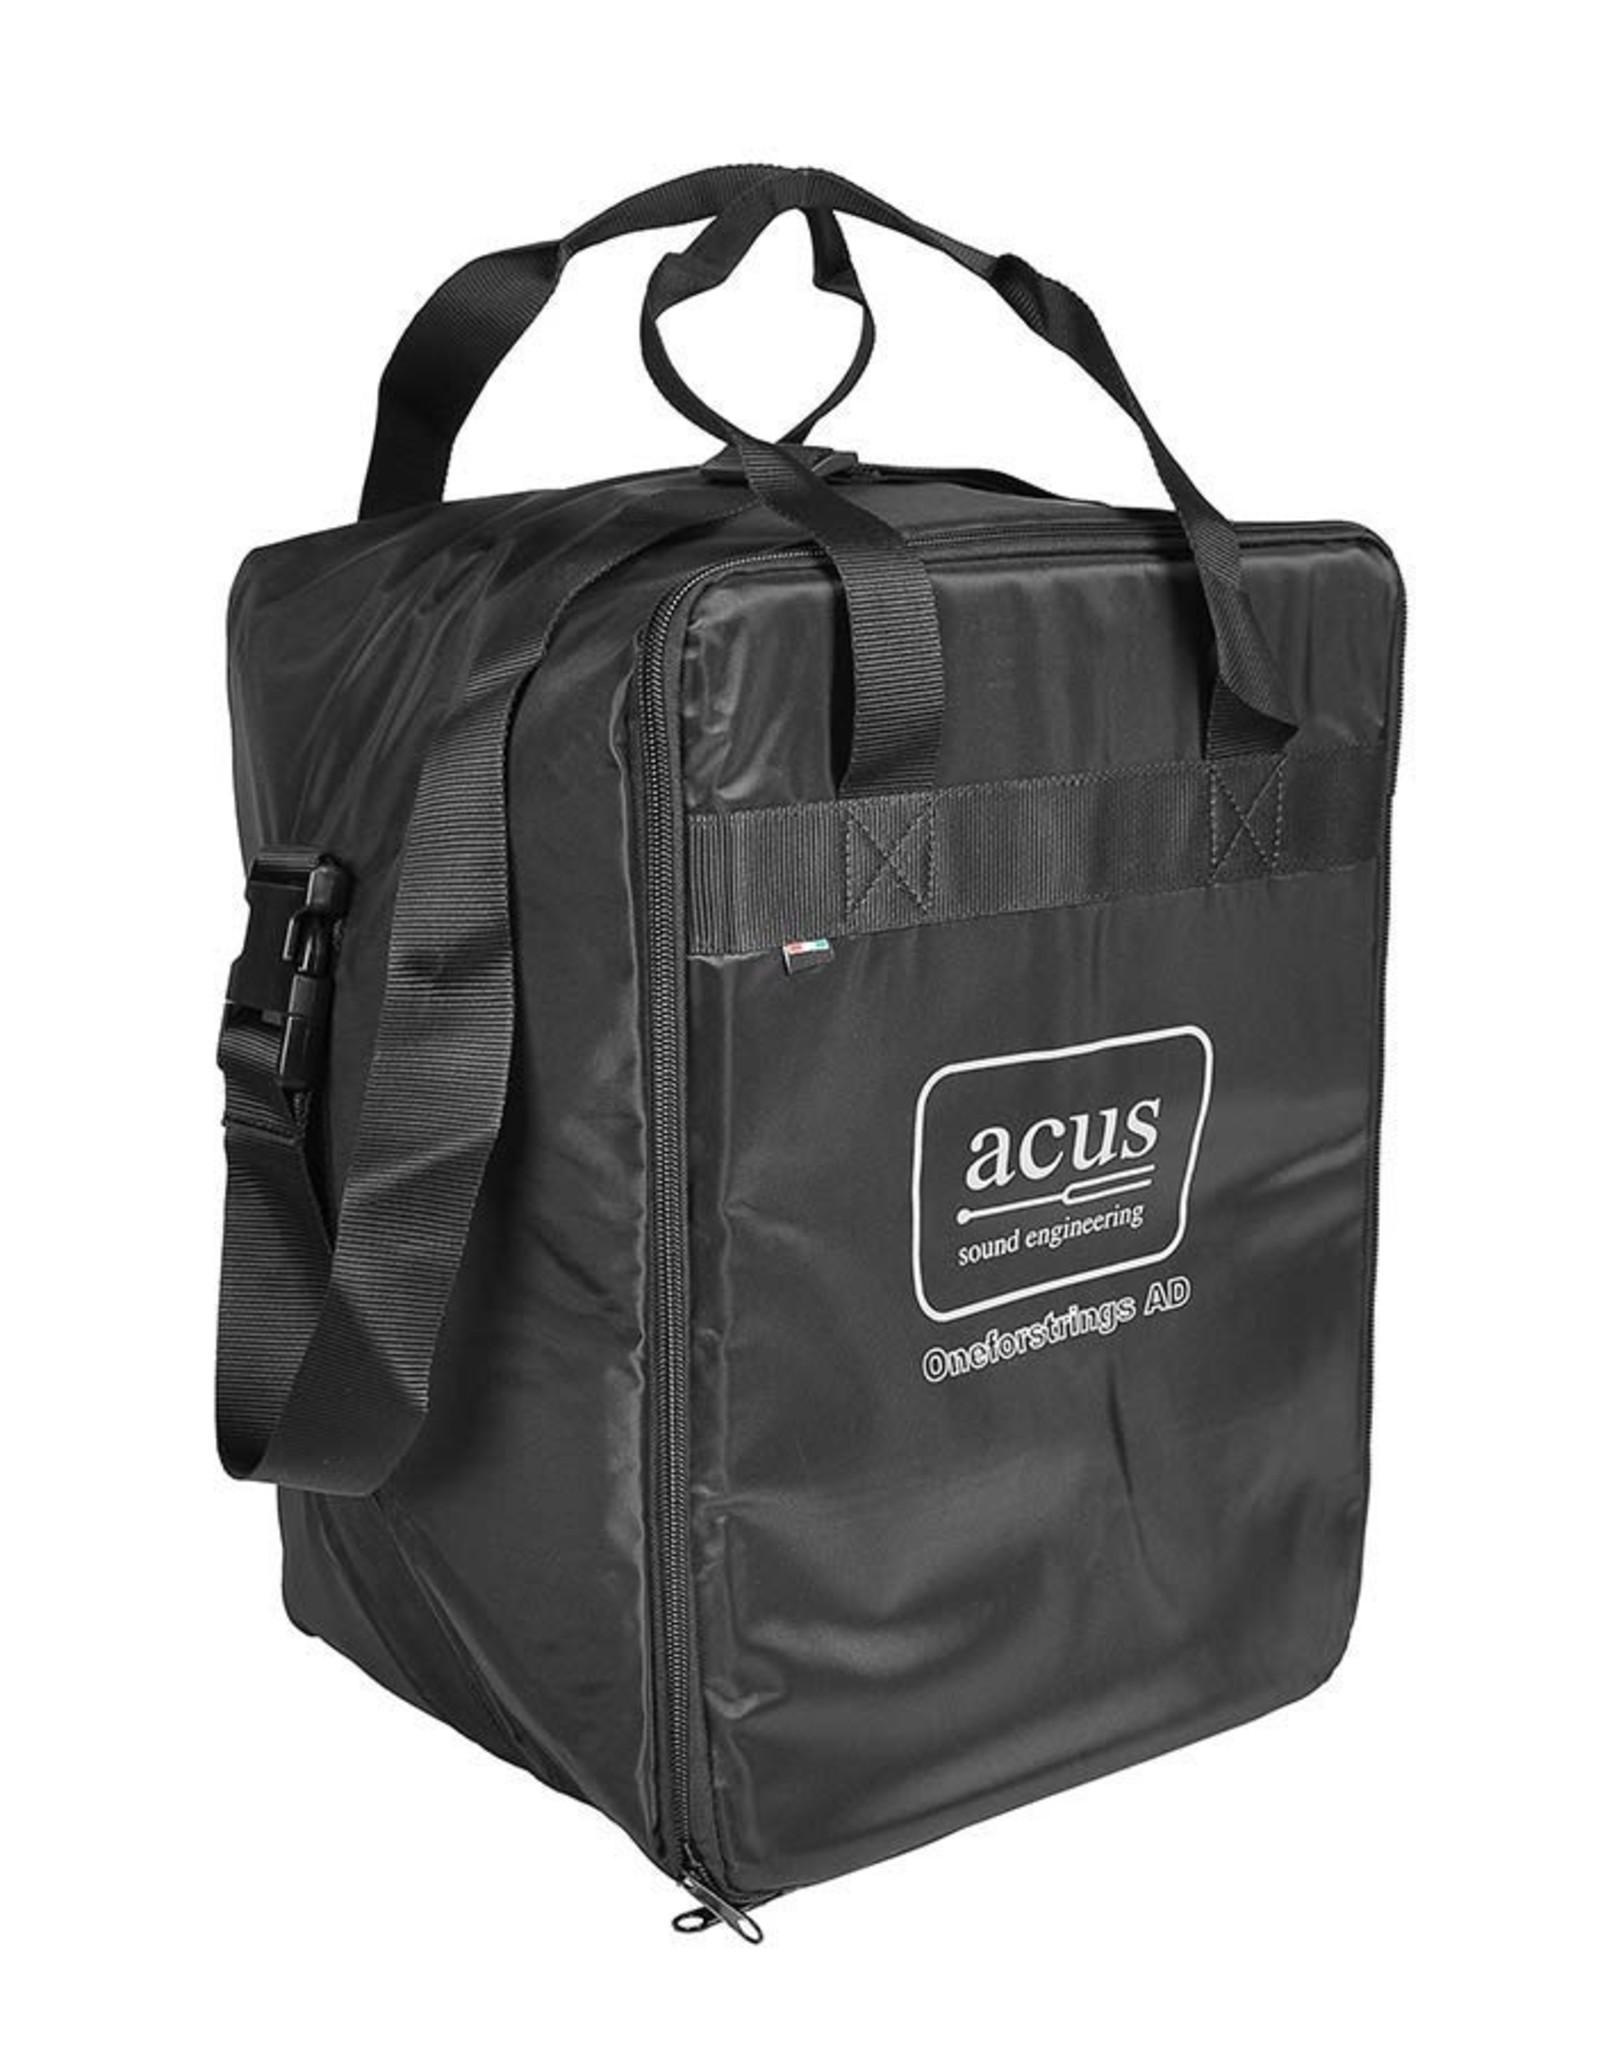 Acus Acus Bag -AD